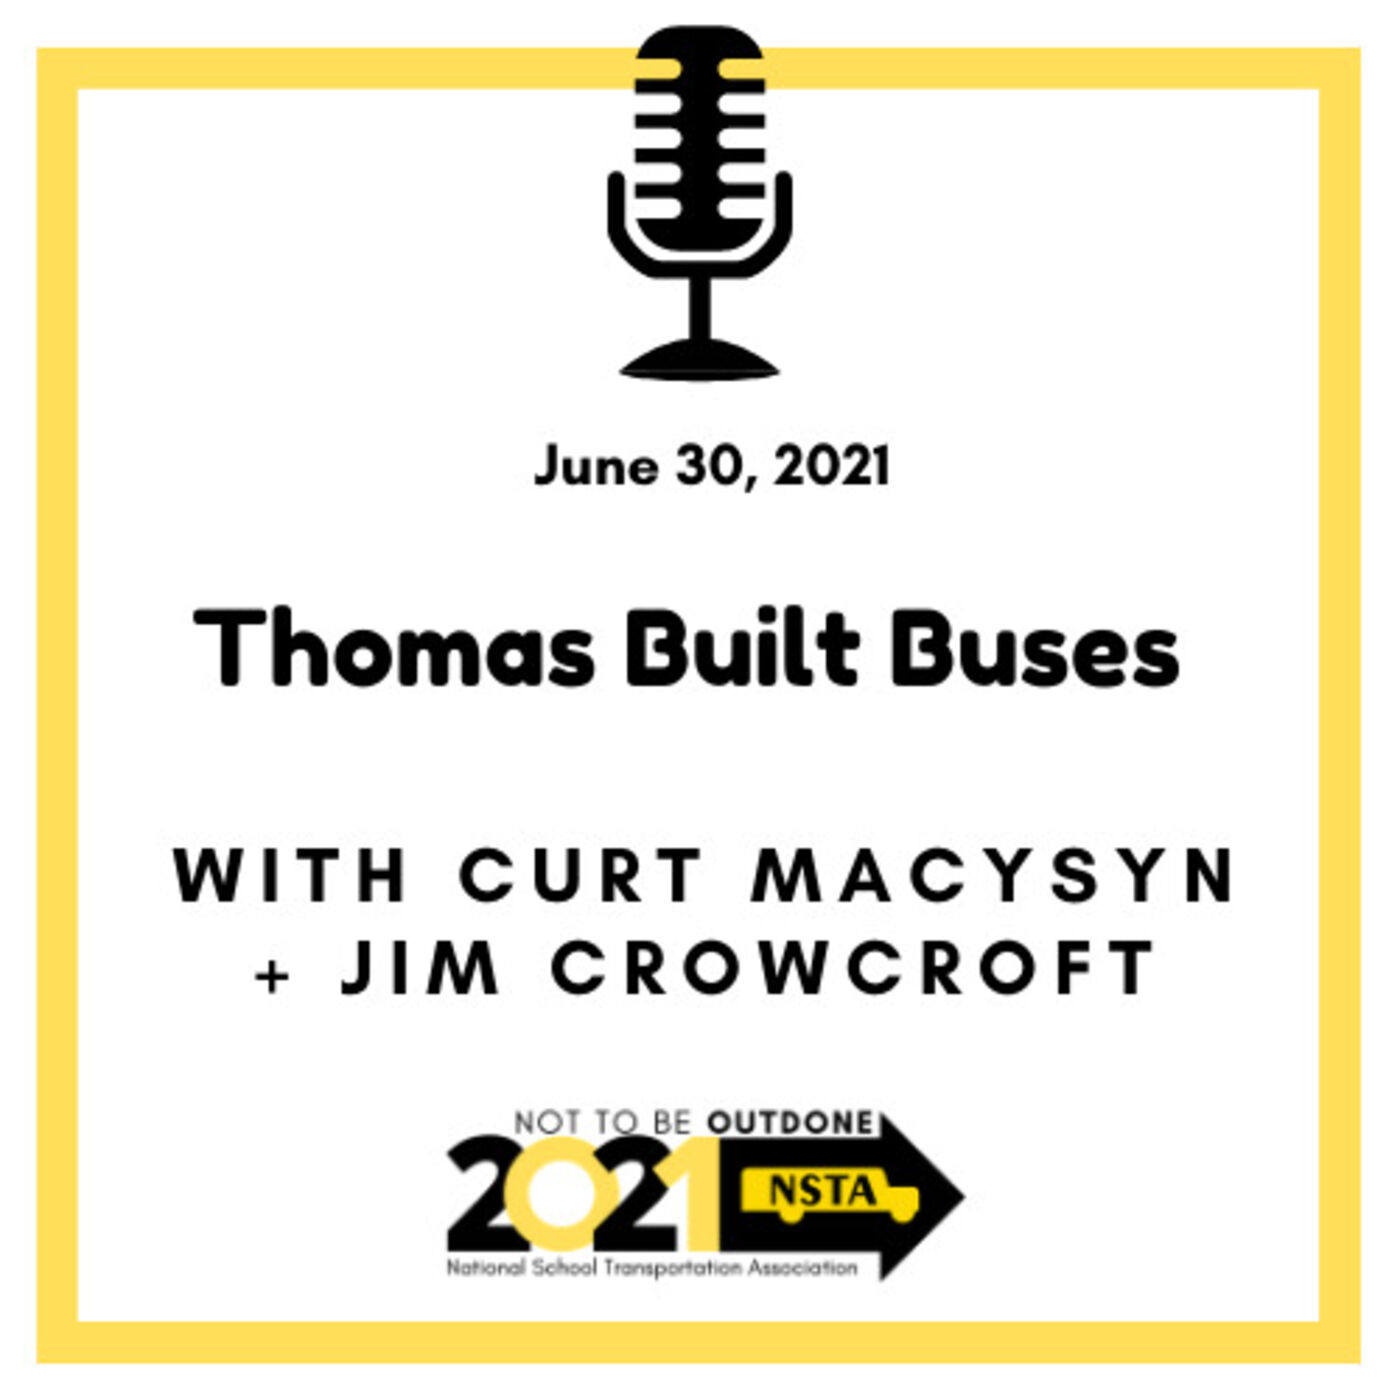 Jim Crowcroft, North American Dealer Sales & Service Manager, Thomas Built Buses